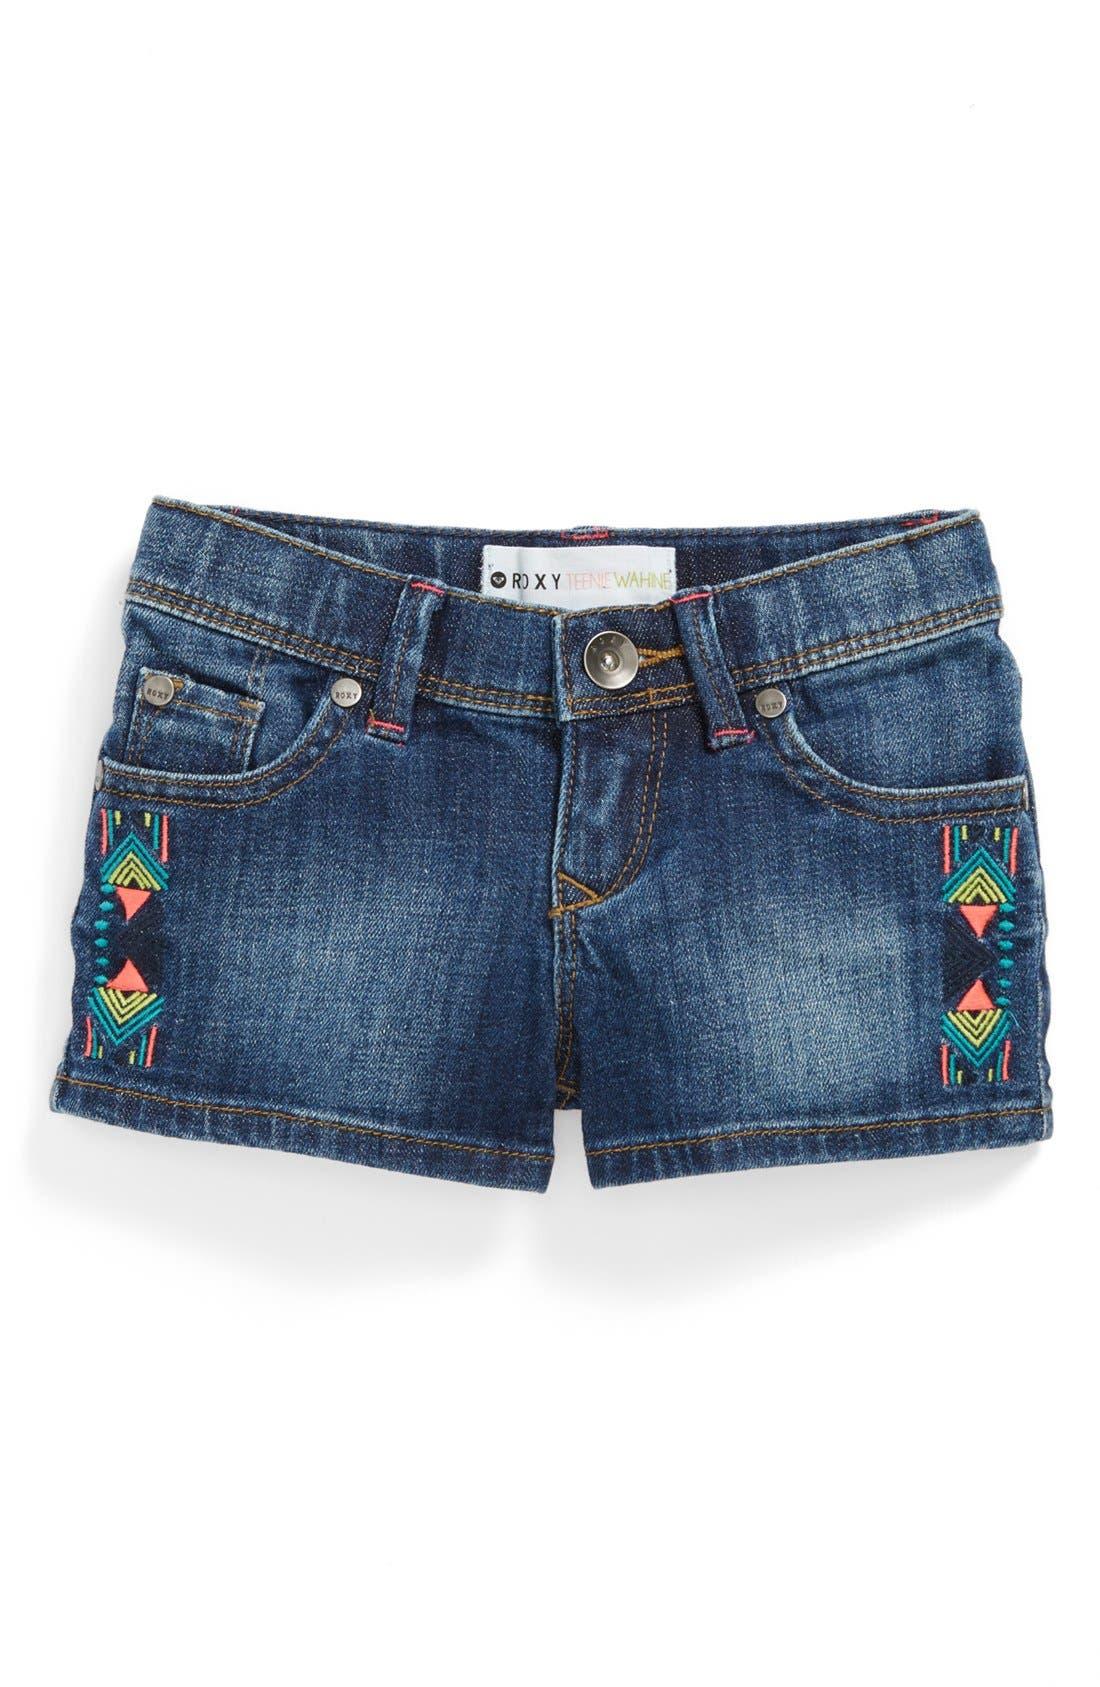 Main Image - Roxy 'Lisy' Shorts (Toddler Girls)